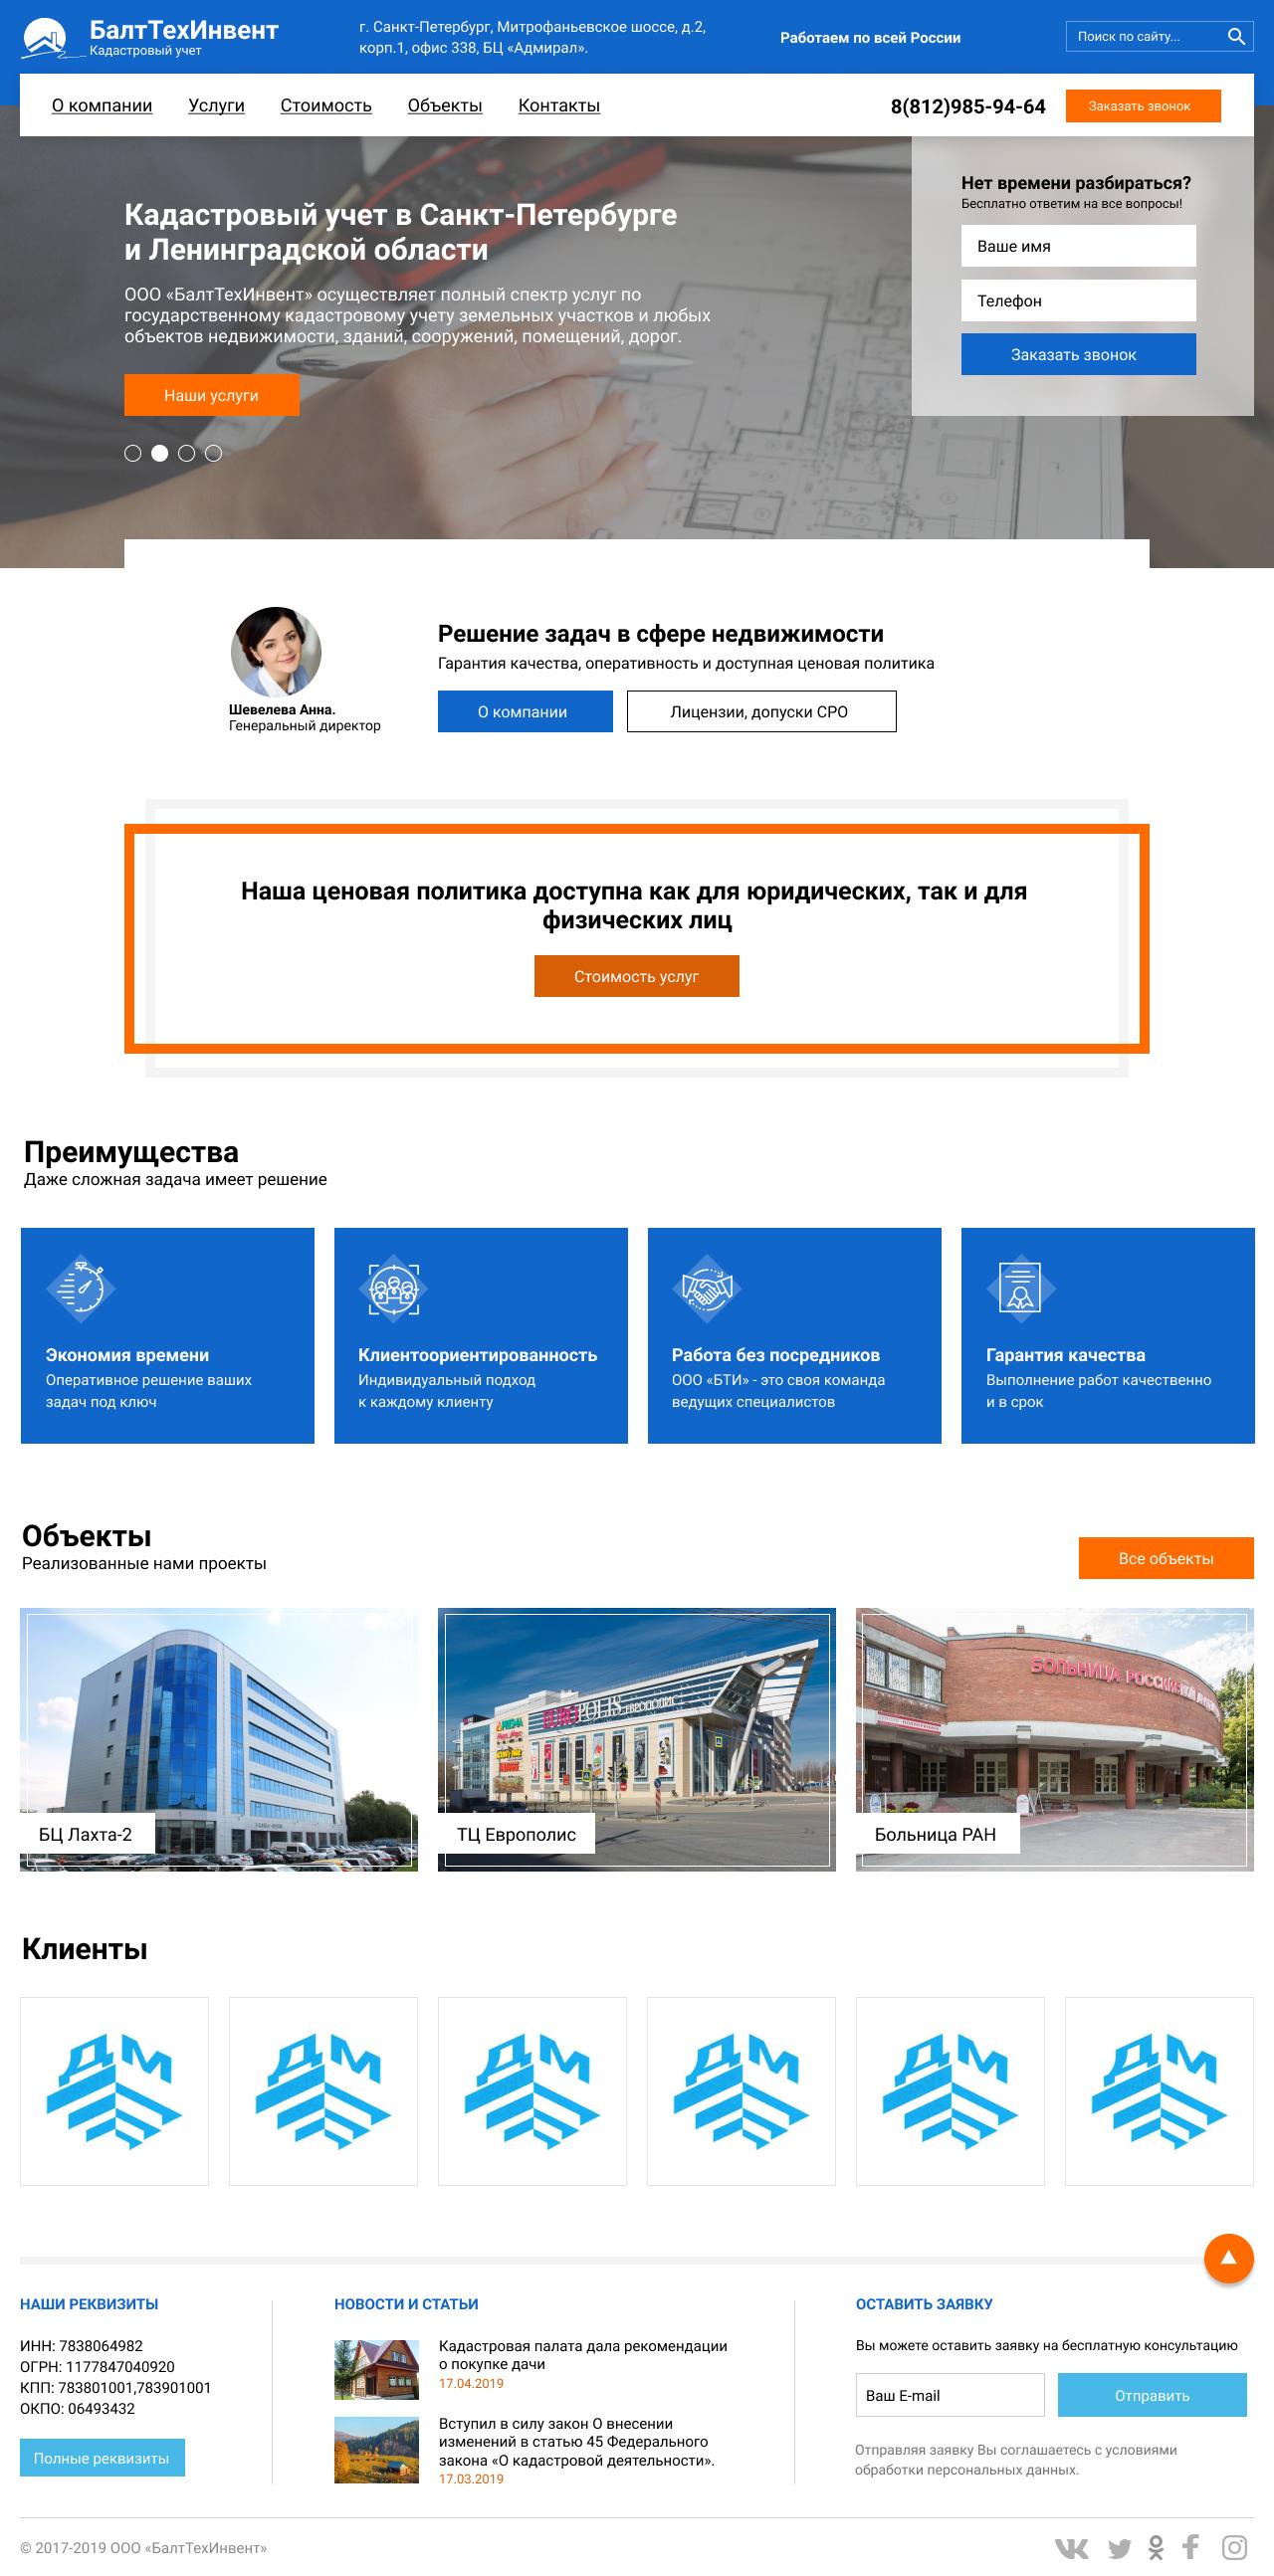 БалтТехИнвент создание сайта